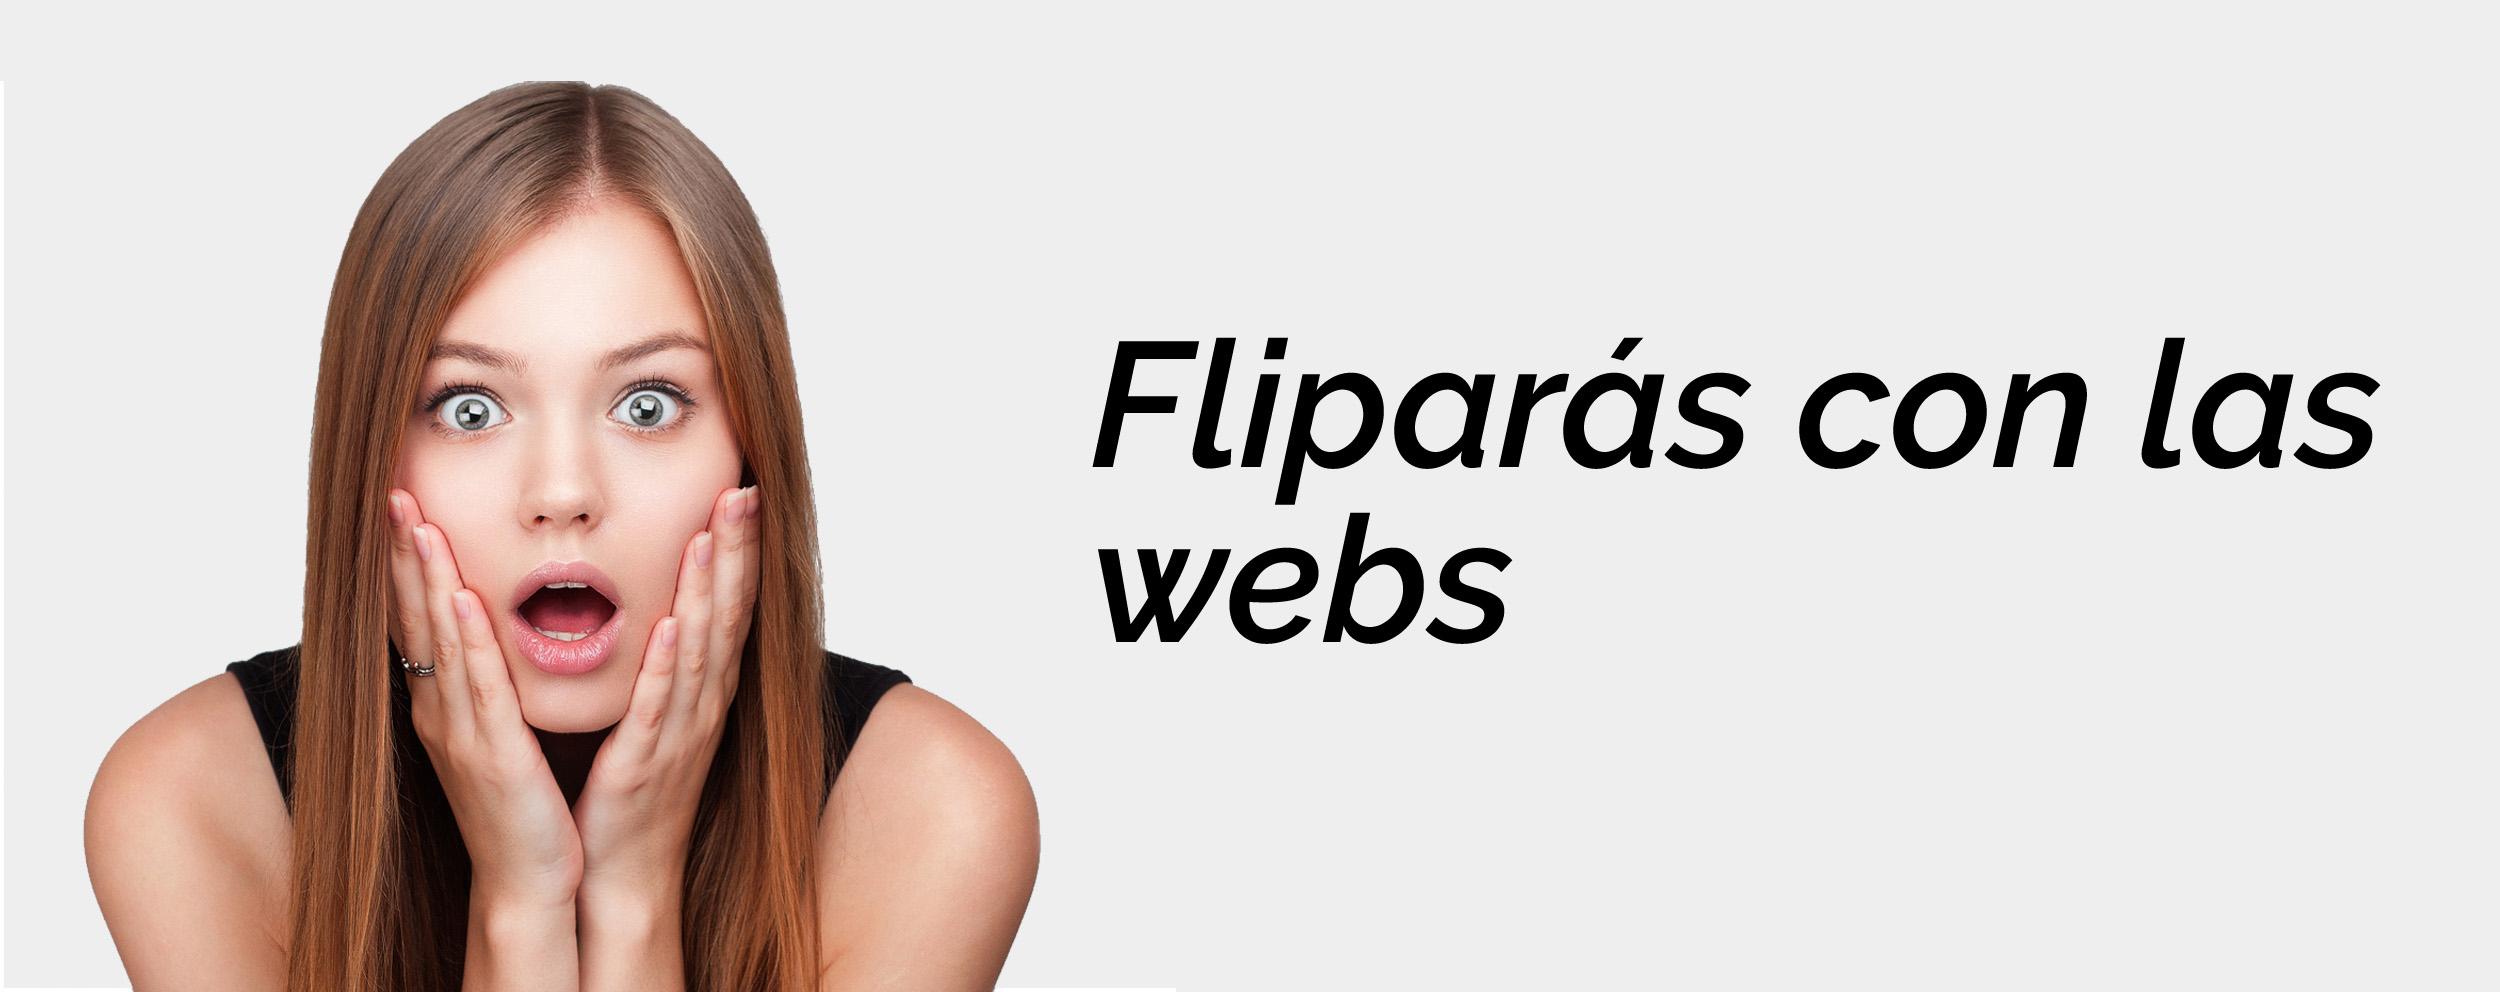 Slider flipa GRANDE 1 español